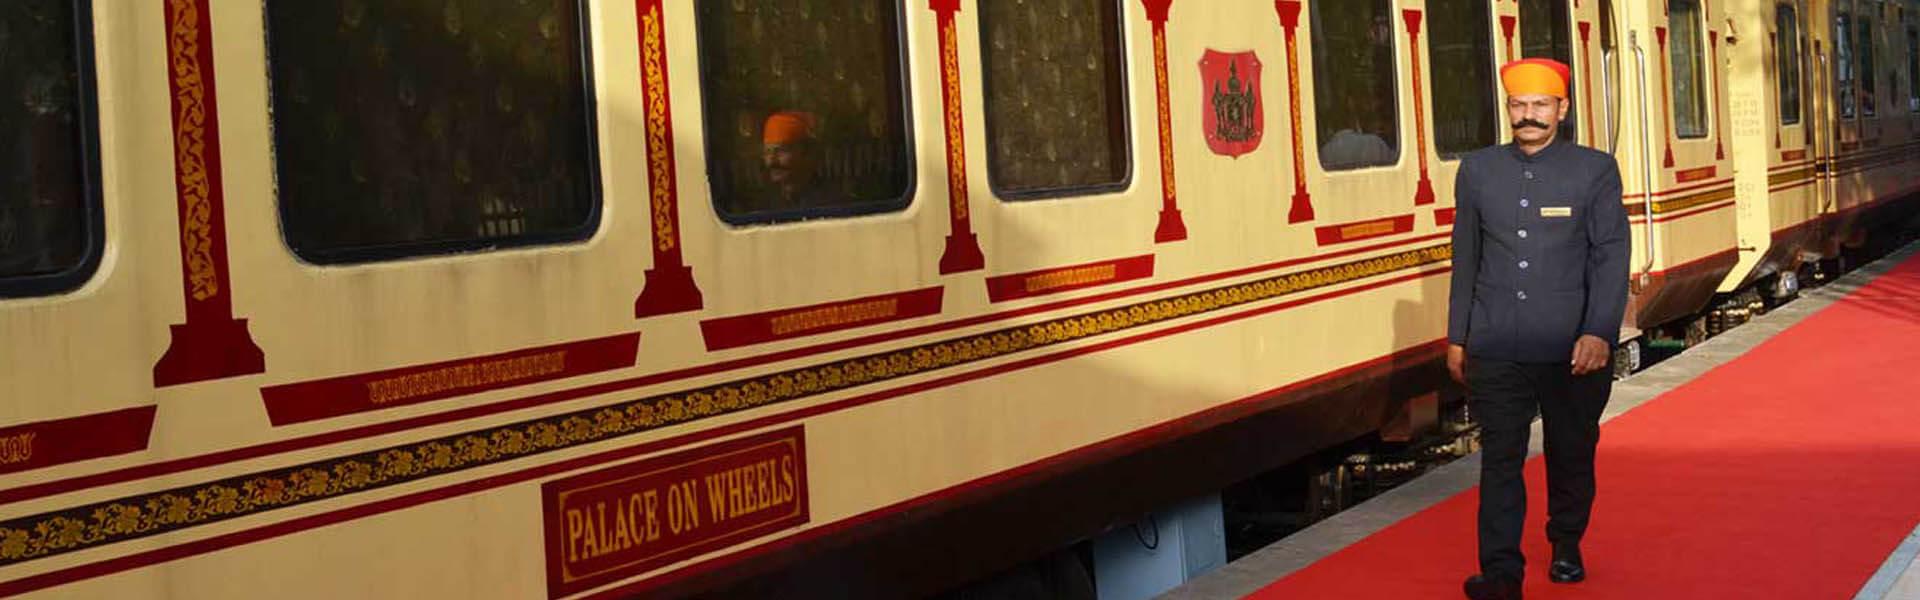 Palace on Wheels,luxury train india,luxury train journey in india